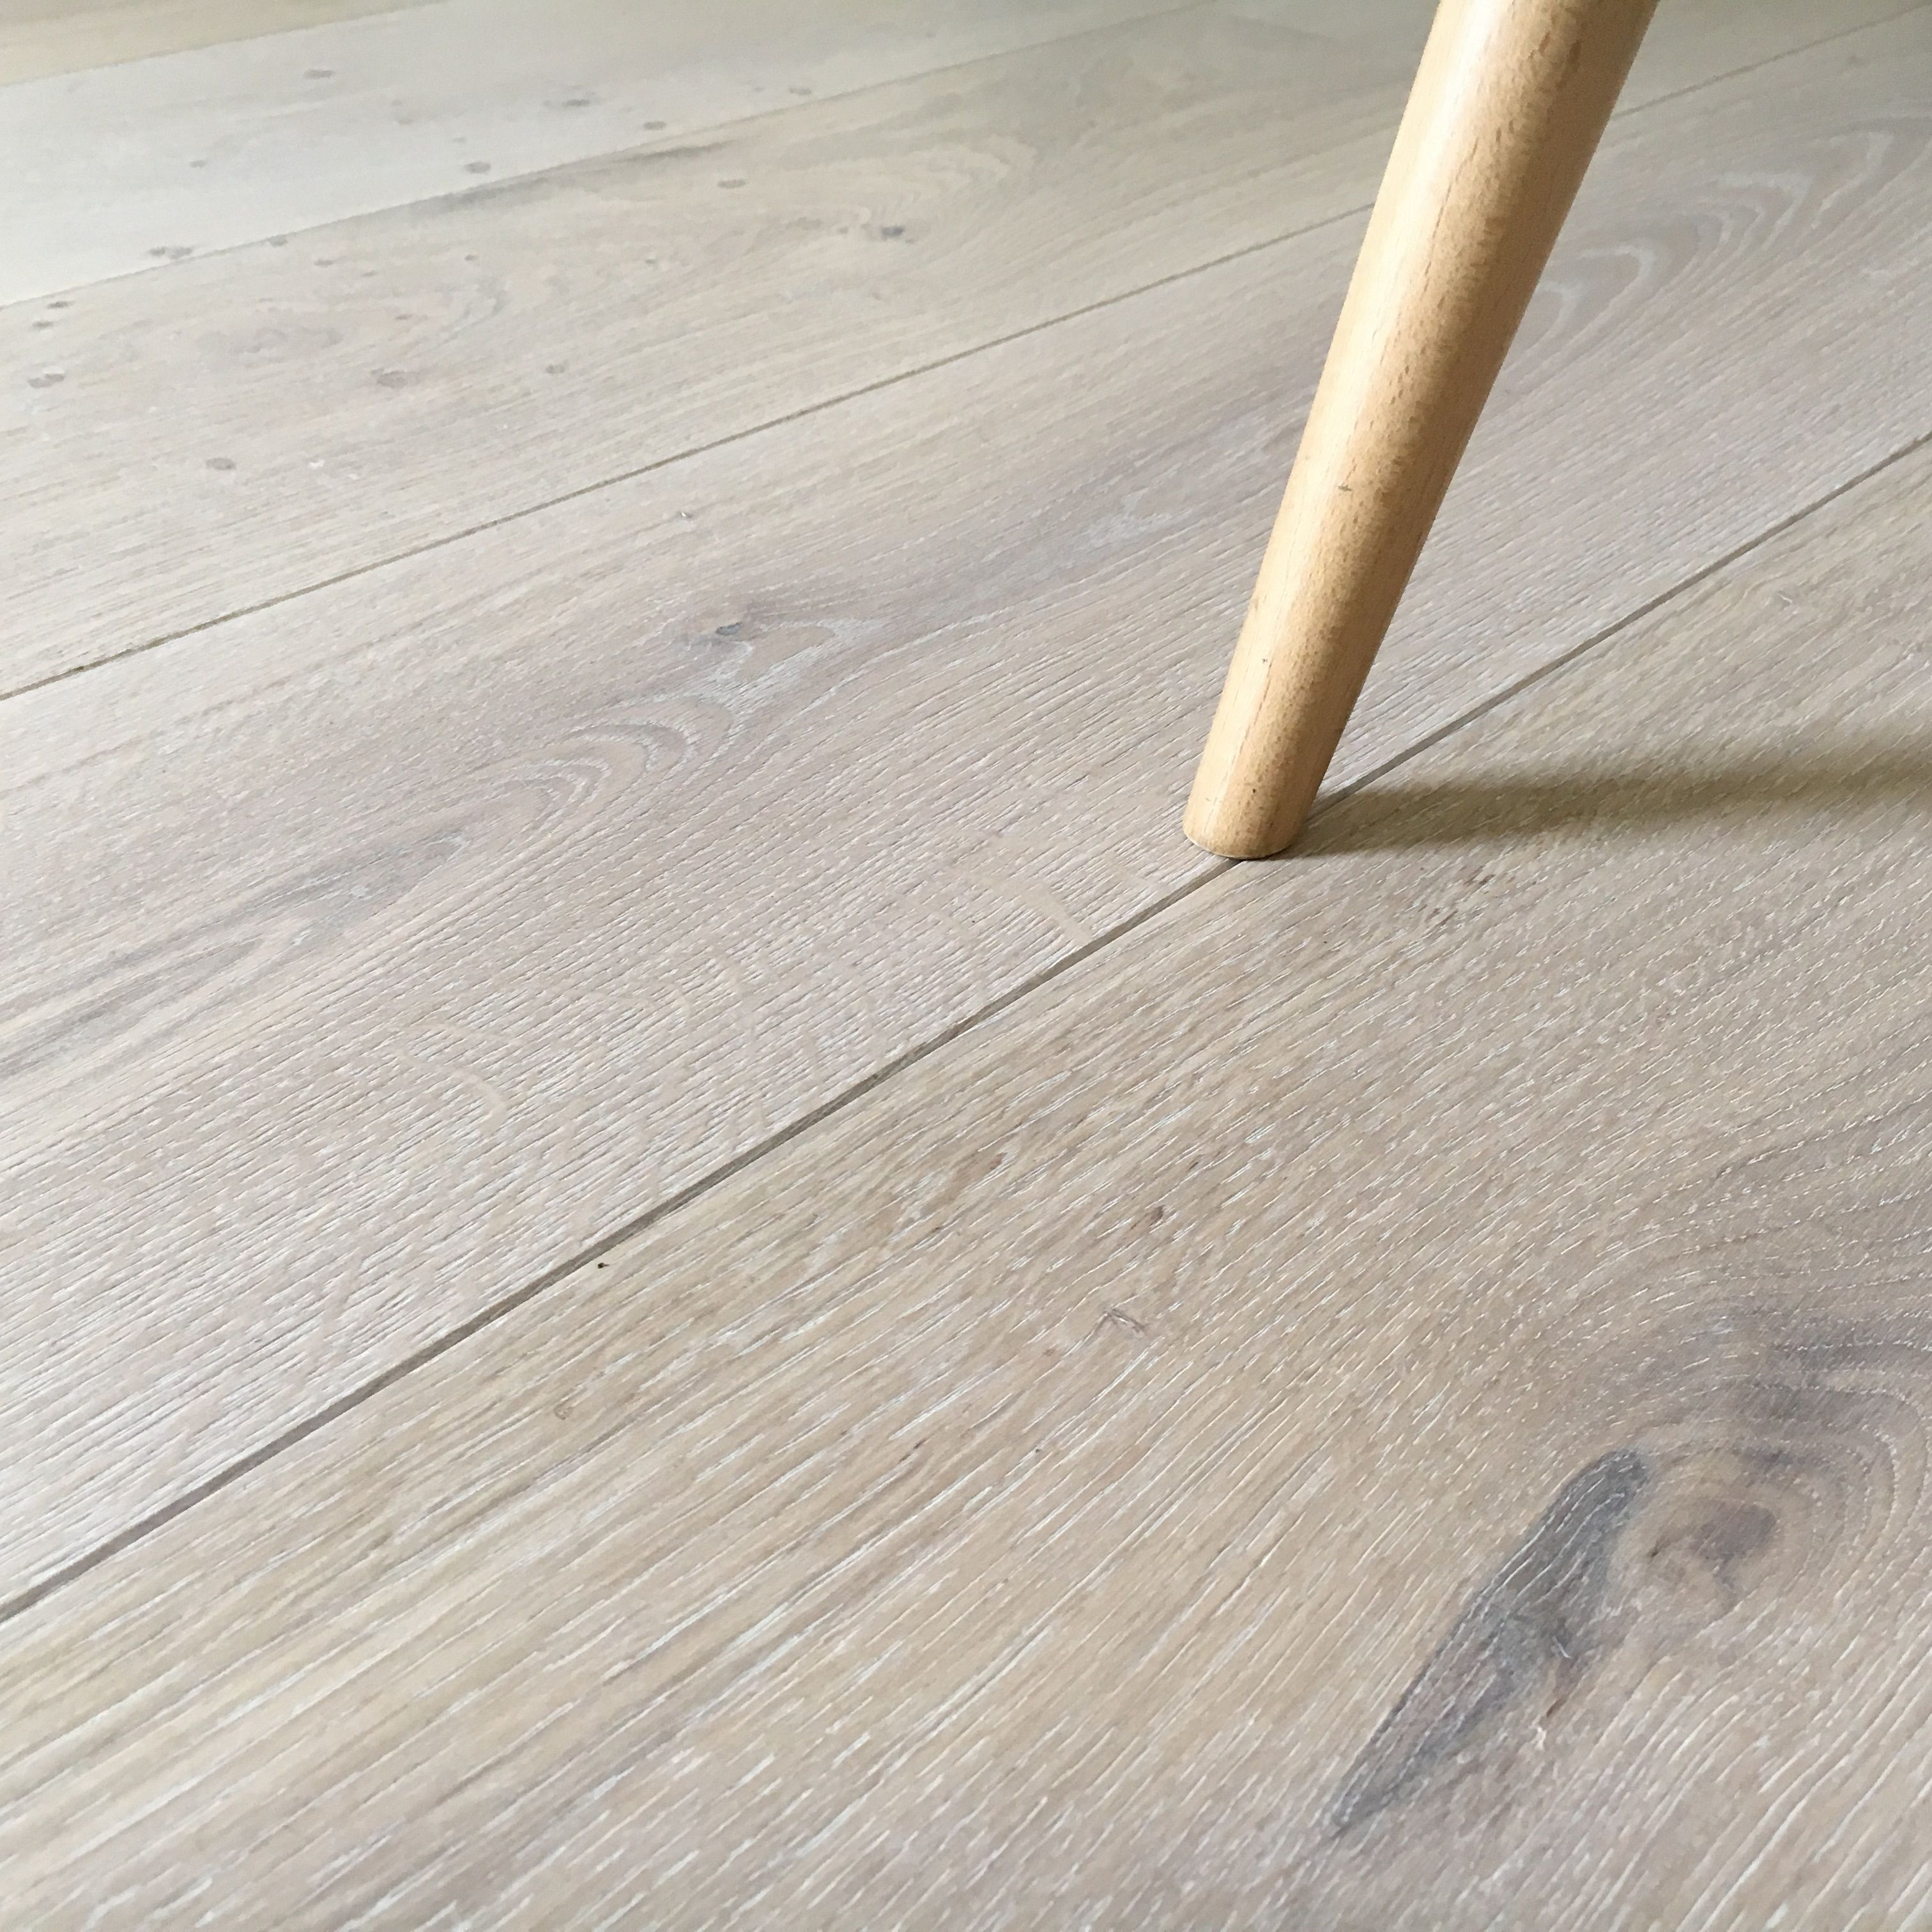 Engineered Oak flooring with a bespoke white wash oil